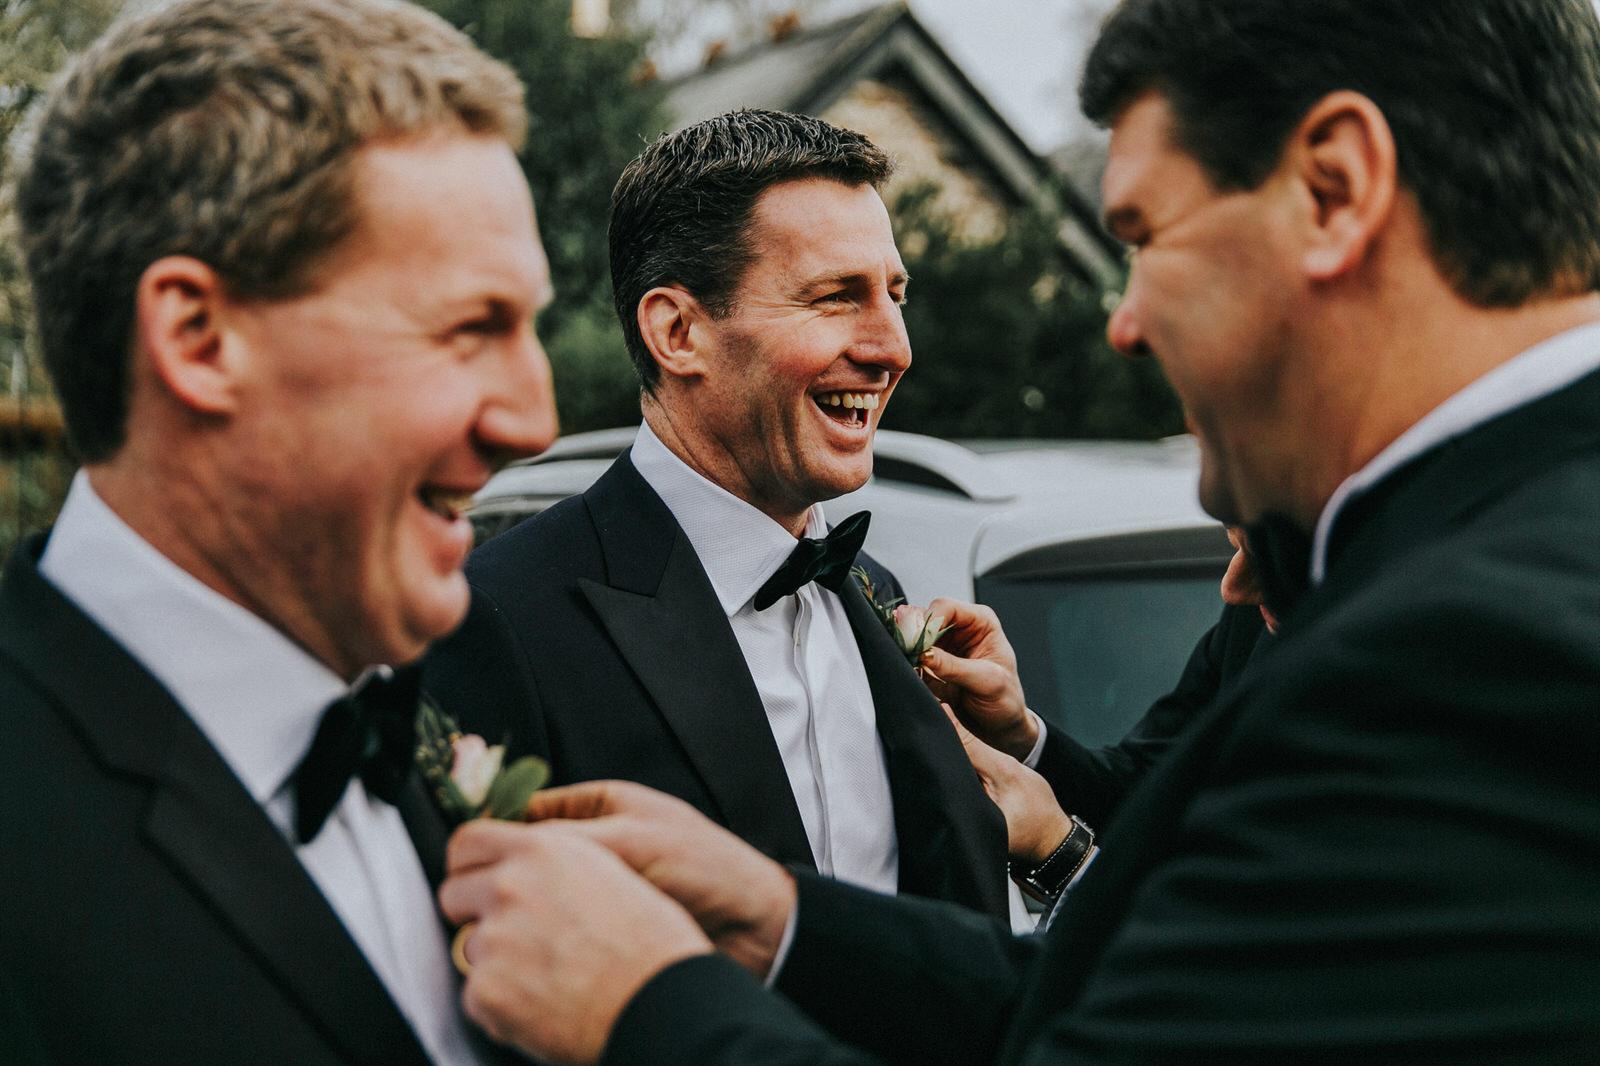 Dunbrody_House_Wedding_photographer_030.jpg